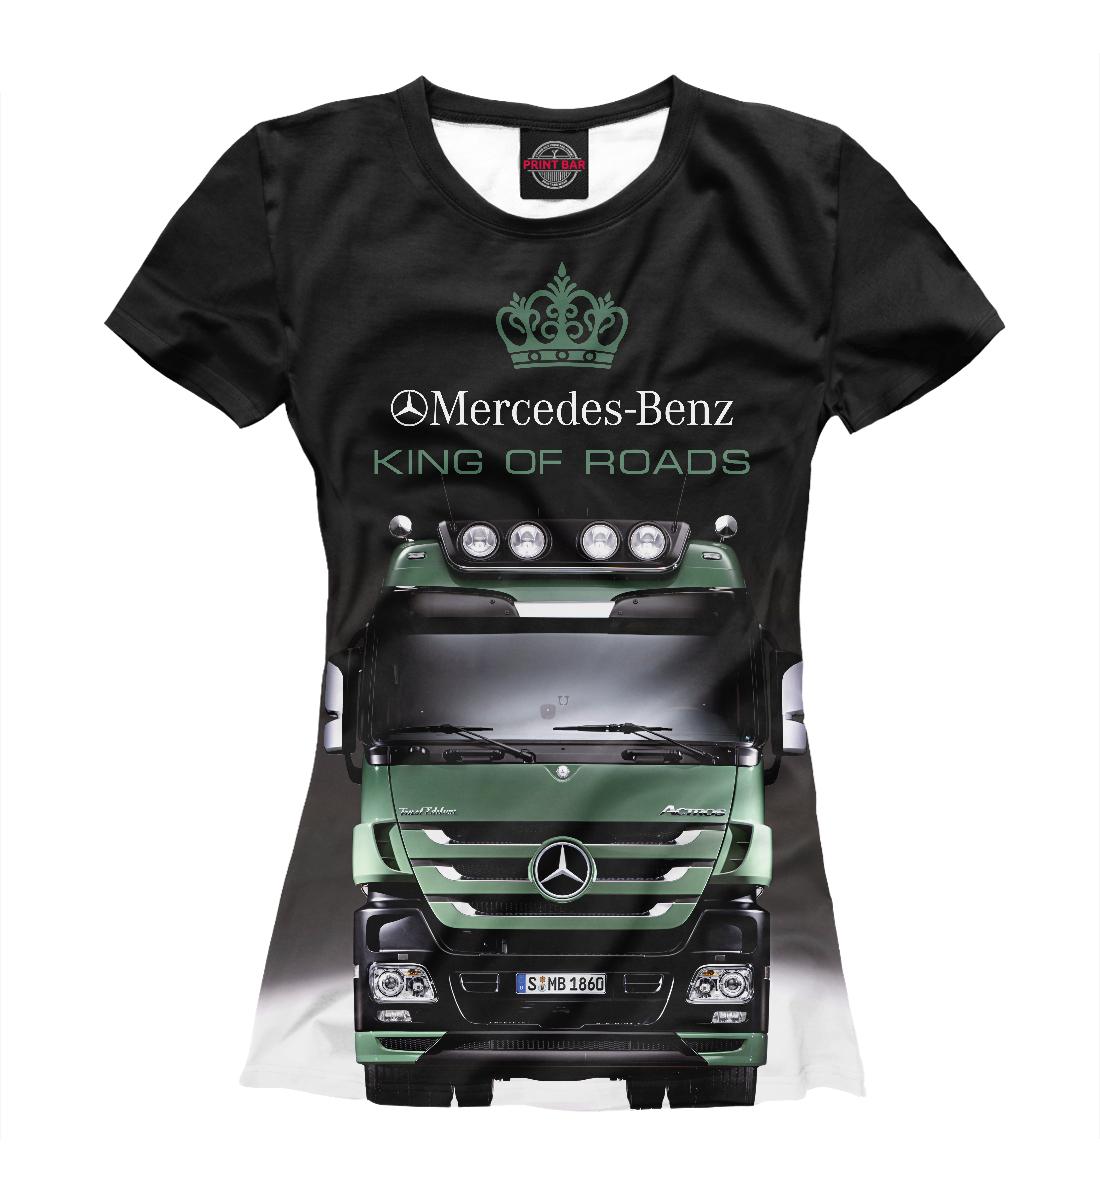 Купить MERCEDES - король дорог, Printbar, Футболки, GRZ-745563-fut-1